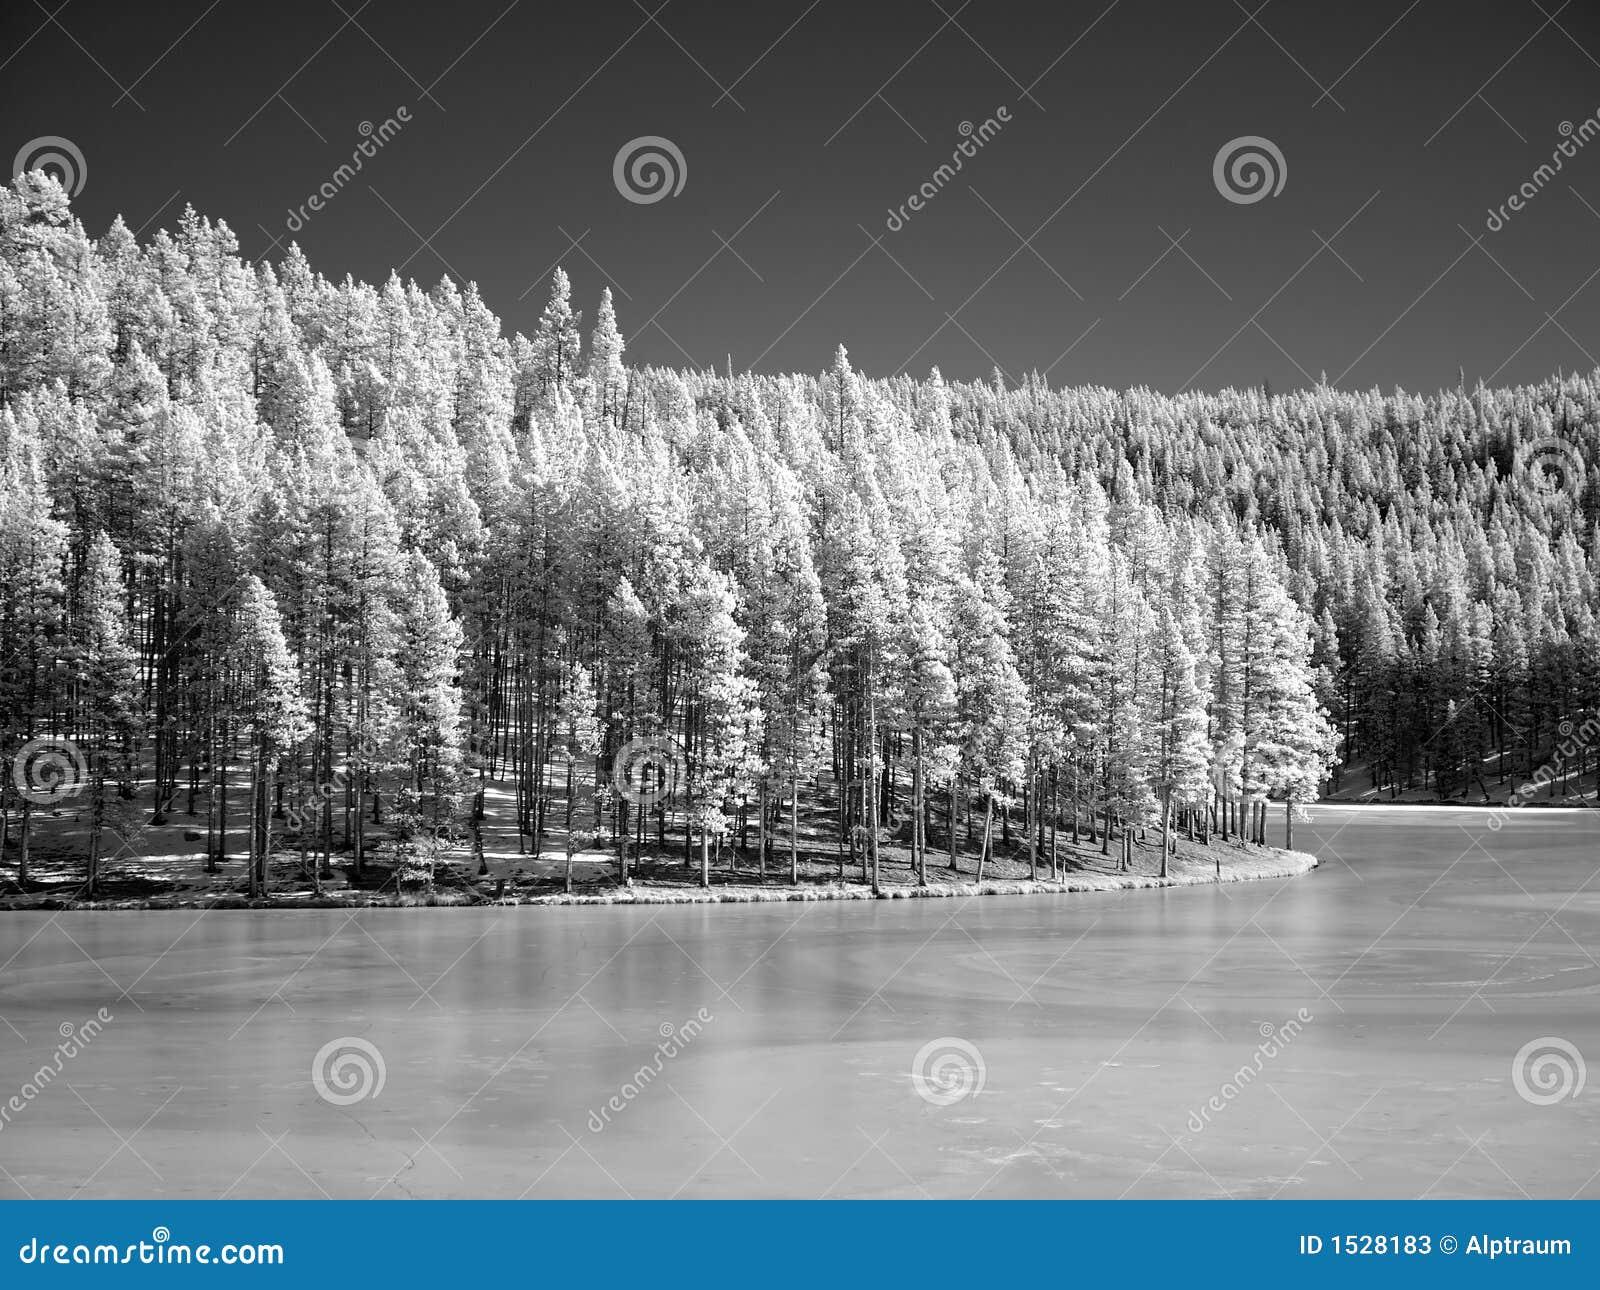 winter landscape in infrared